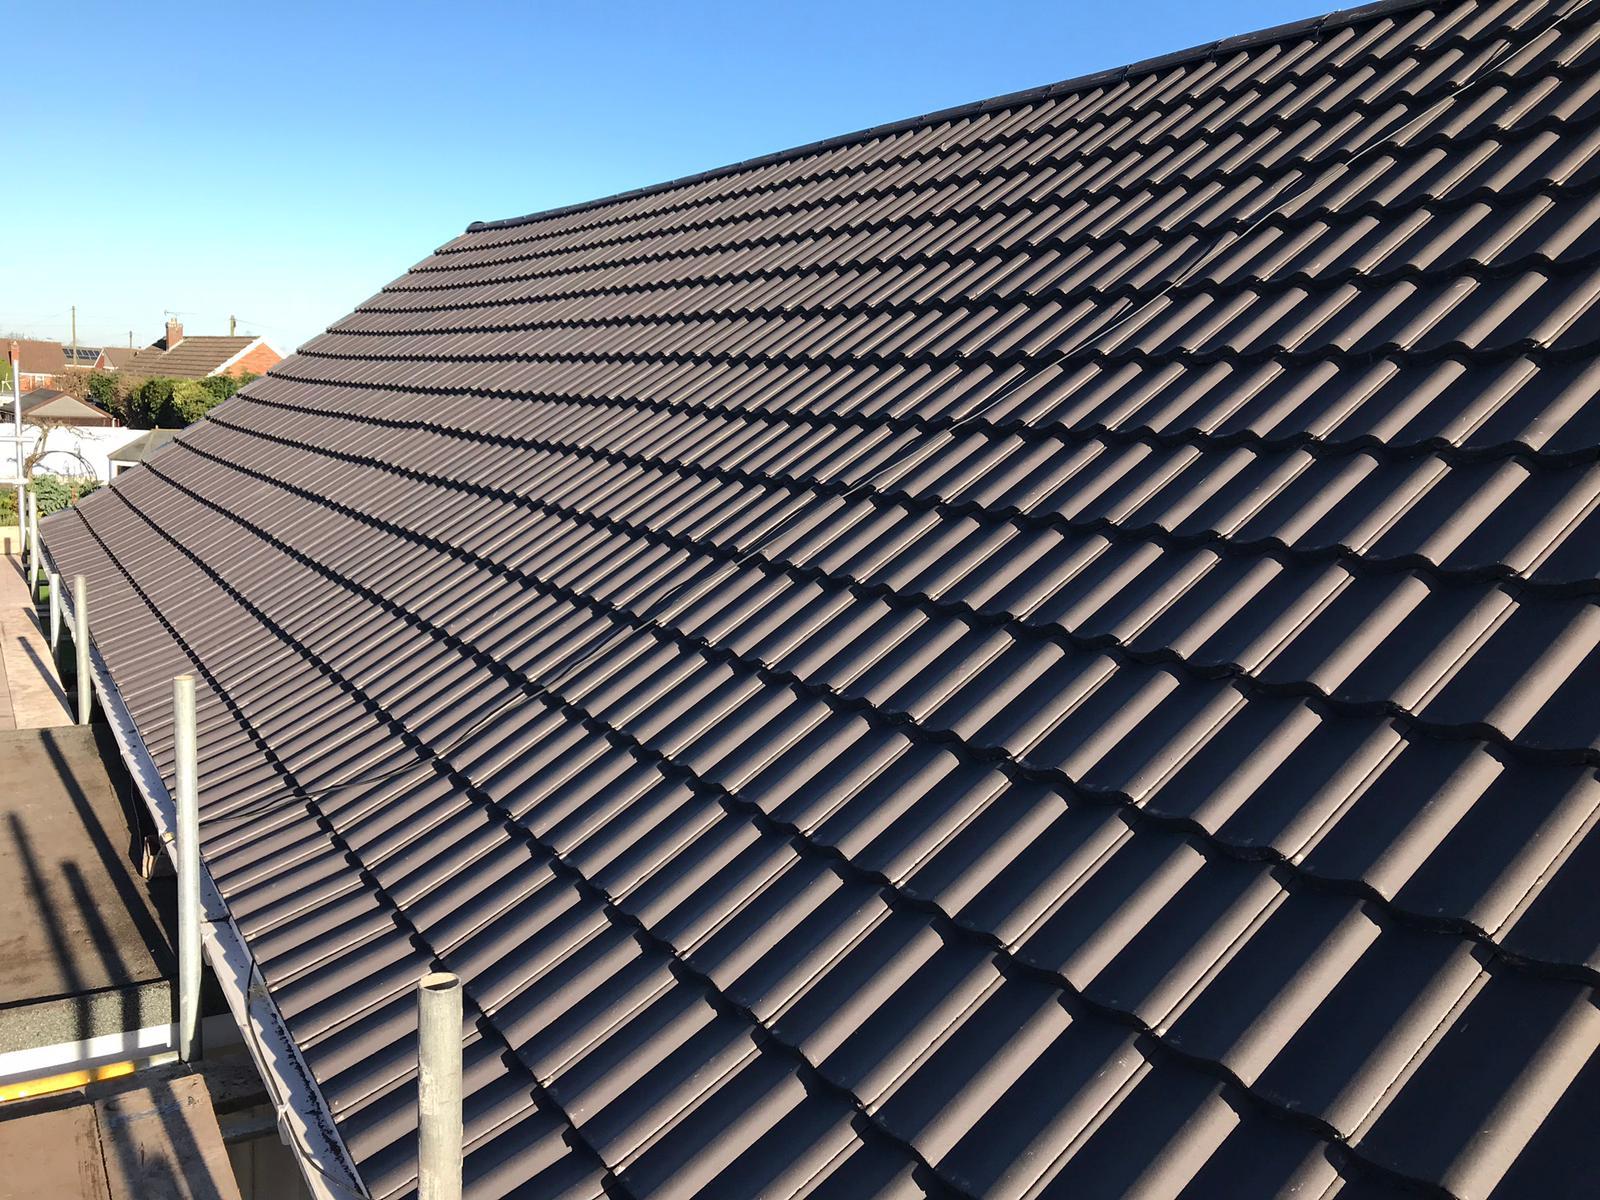 slate roofing work